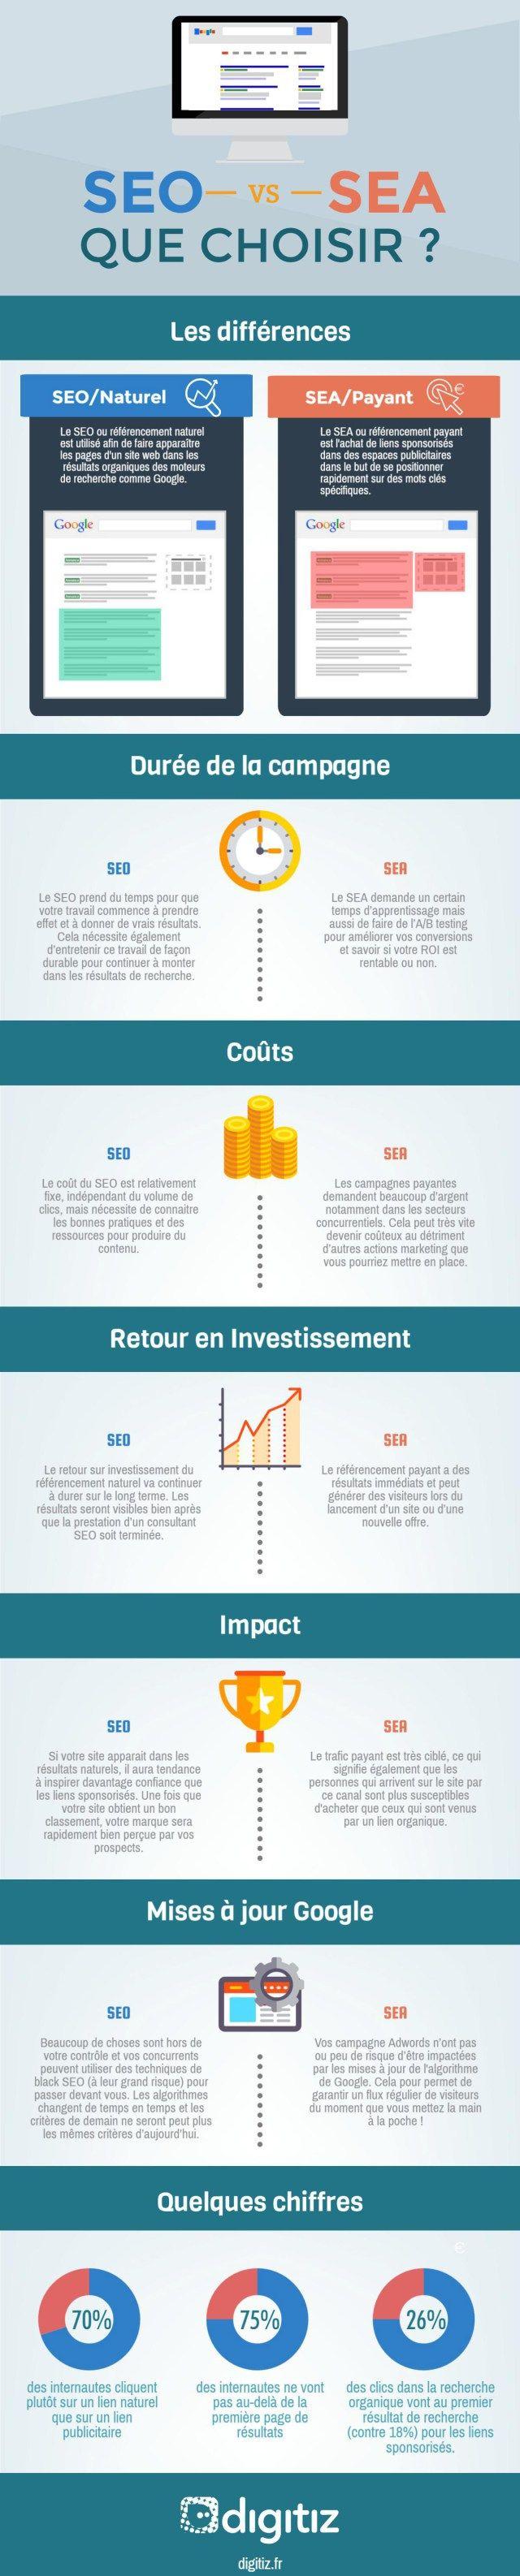 infographie-seo-vs-sea